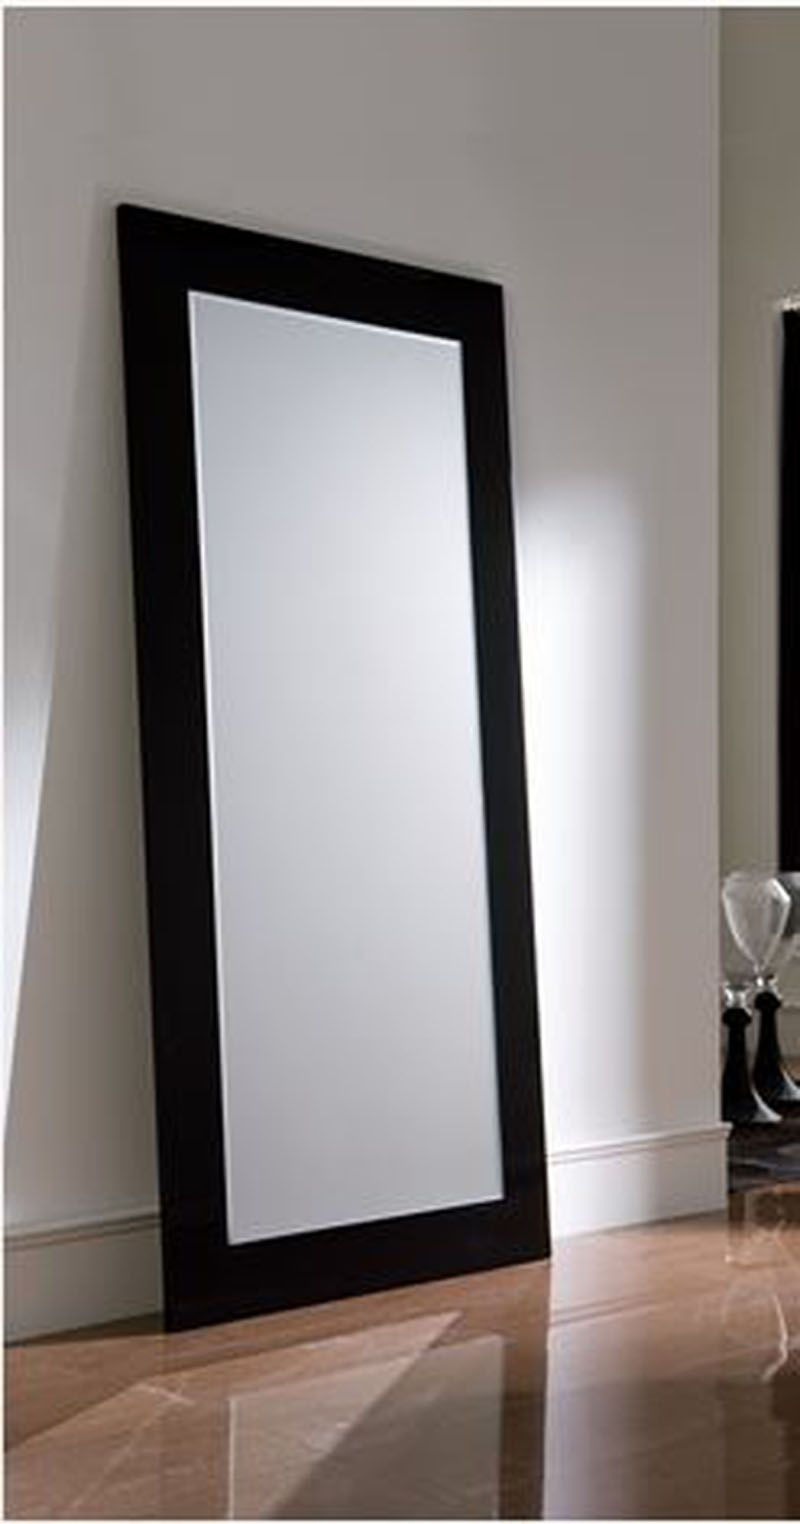 Espejos Modernos Vestidor Negro Sanpablines Manualidads - Espejos-modernos